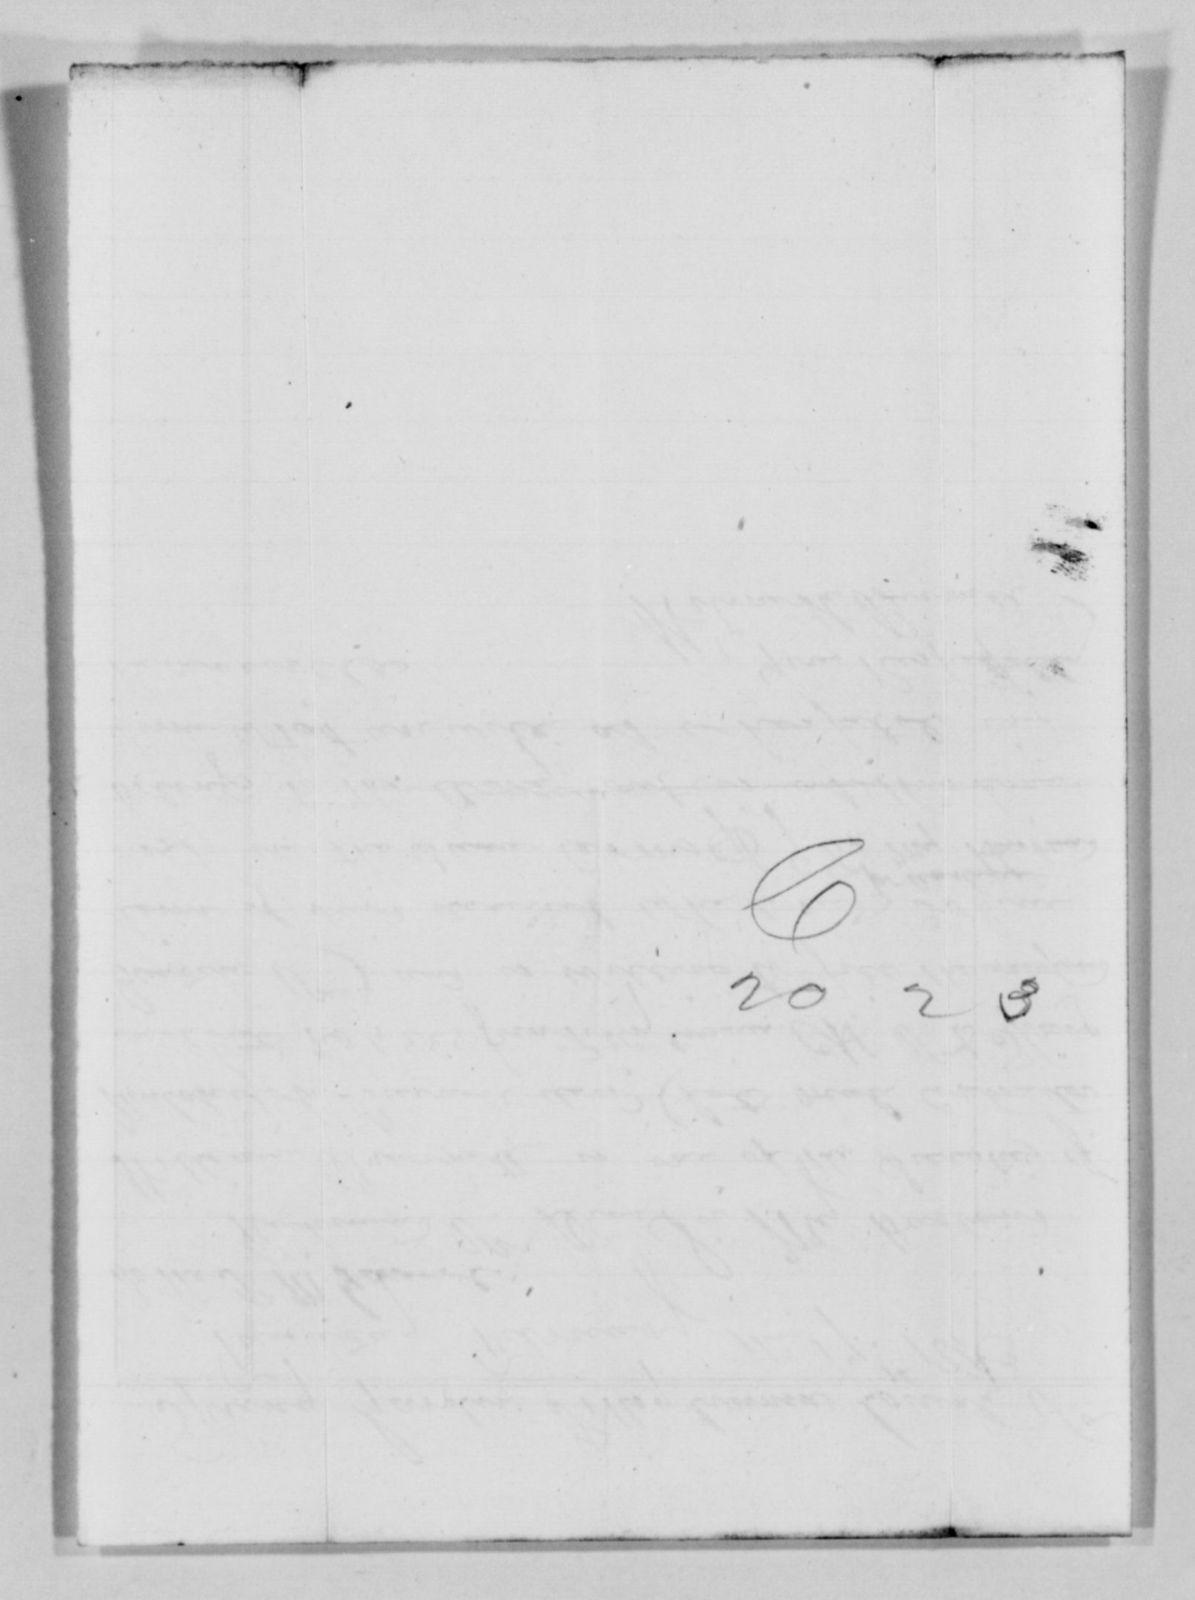 Confederate States of America records: Microfilm Reel 59